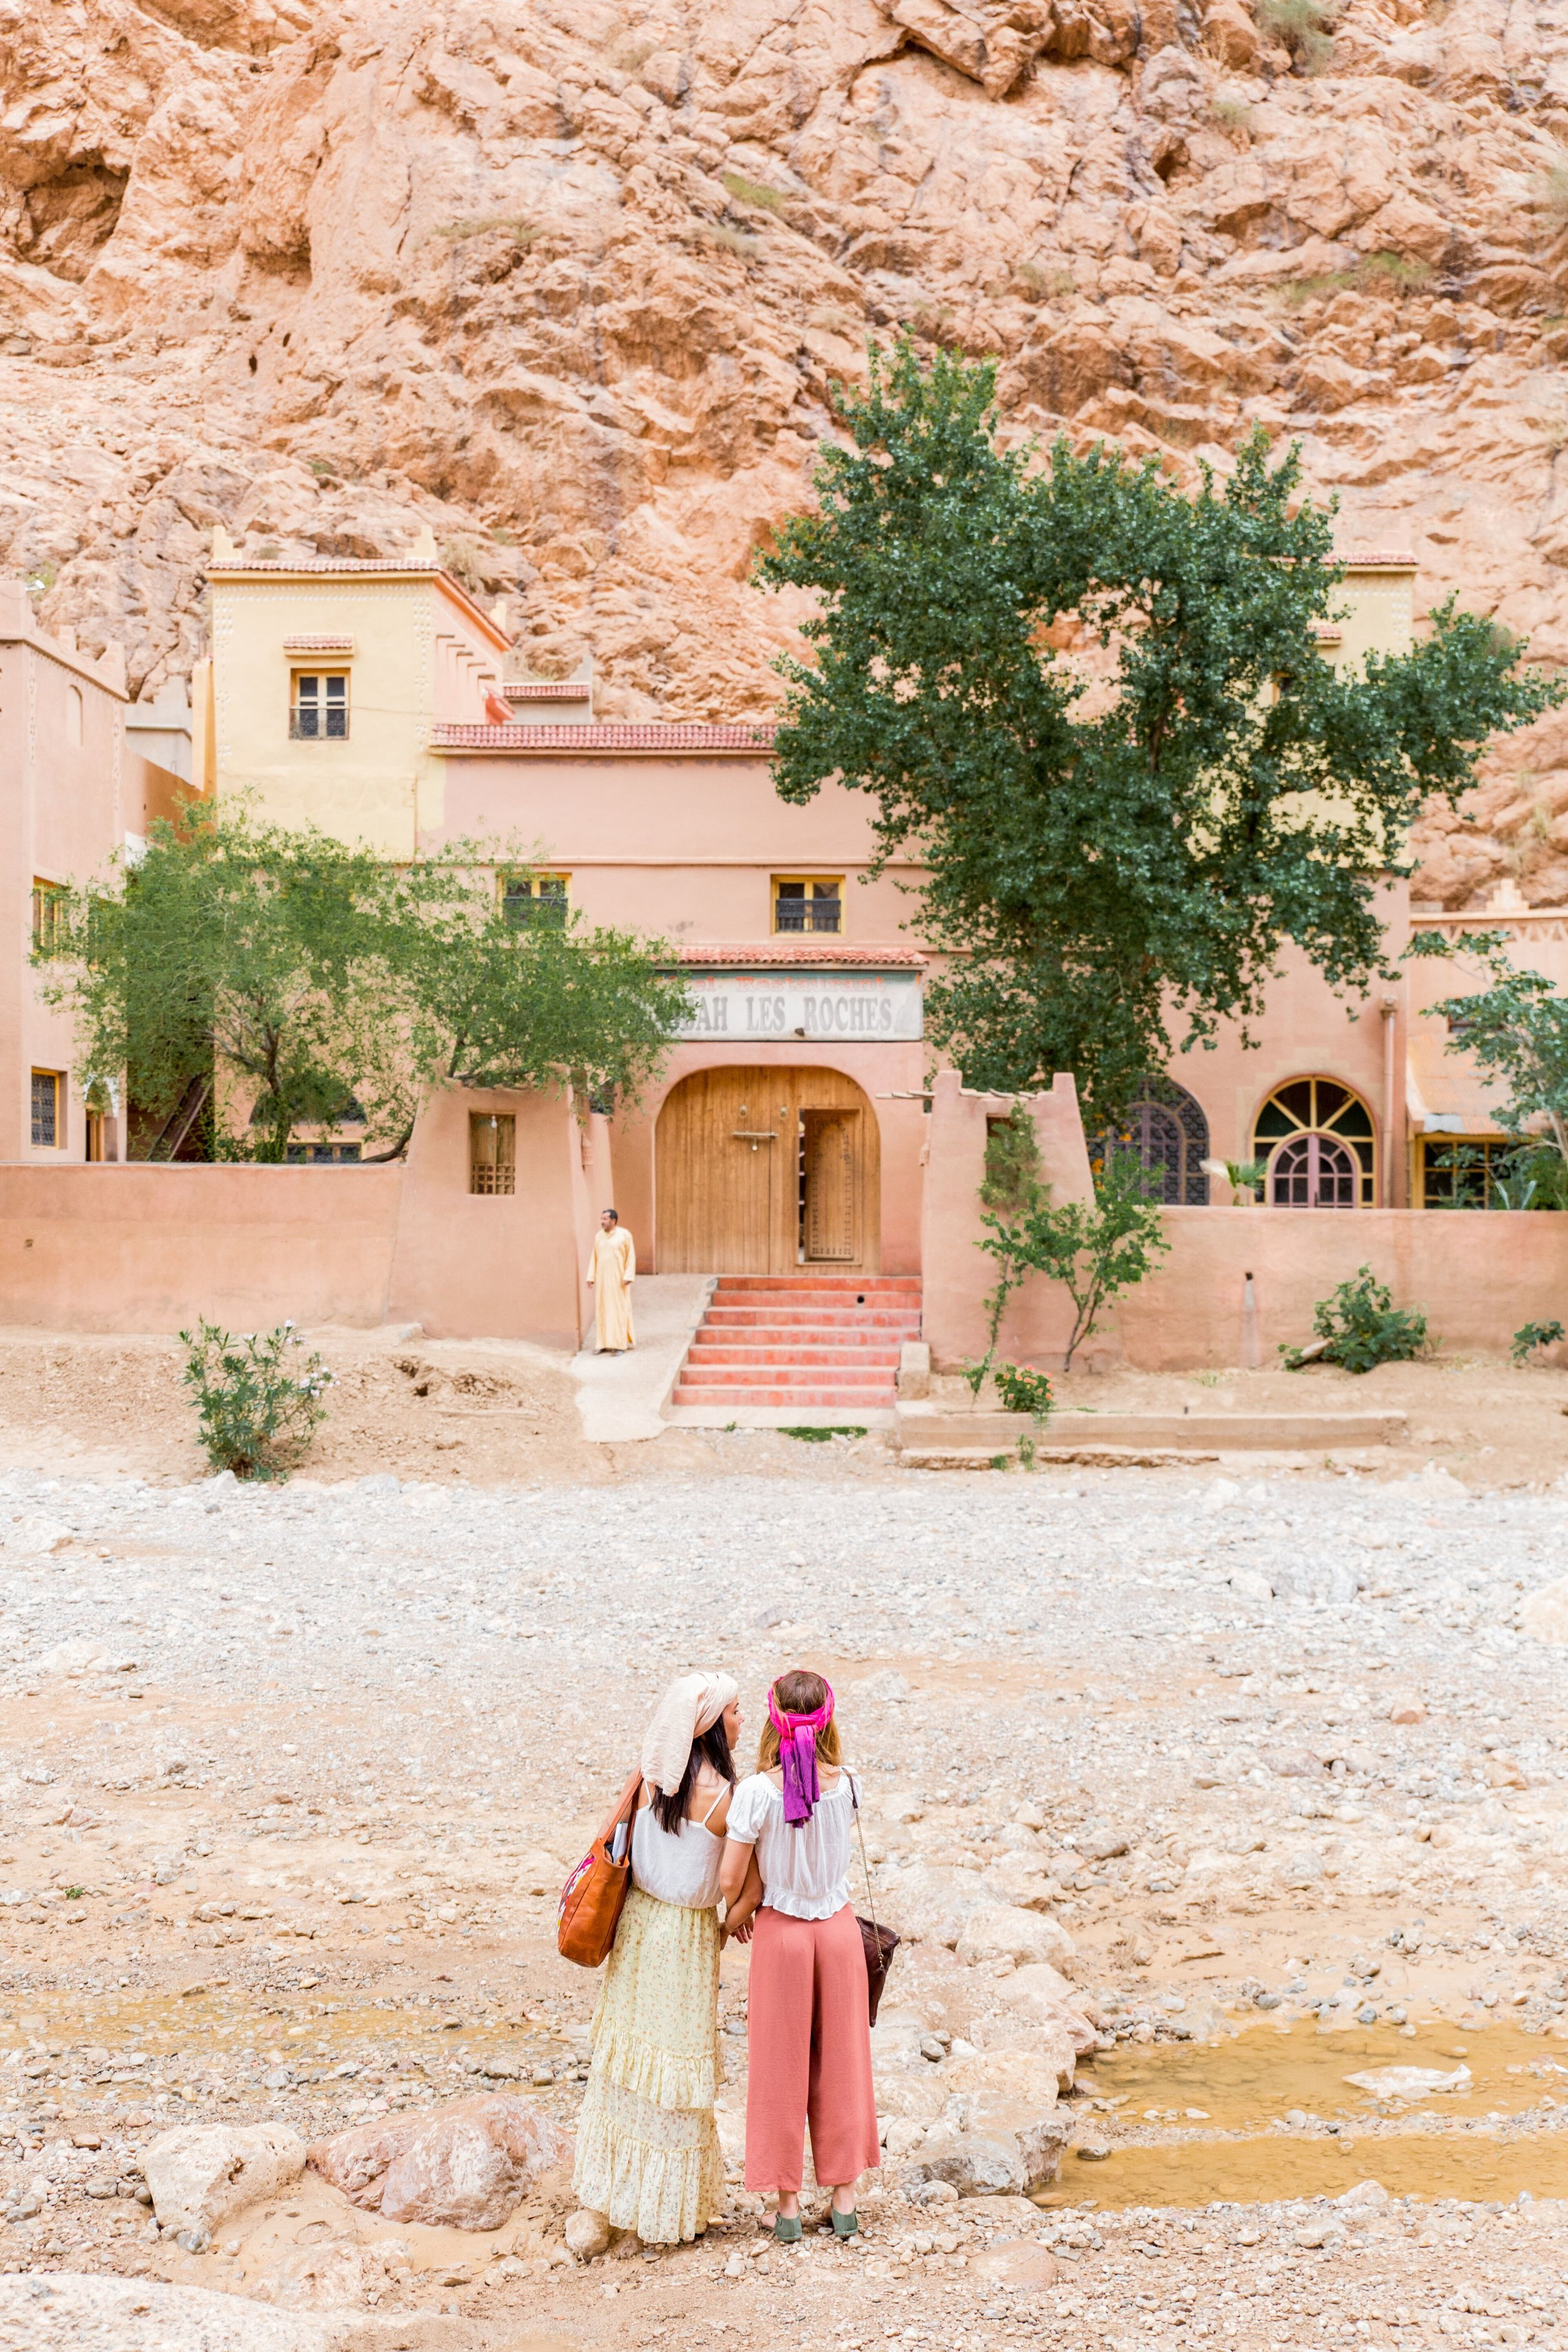 Rondreis-Marokko-Innerdoorway-01.jpeg